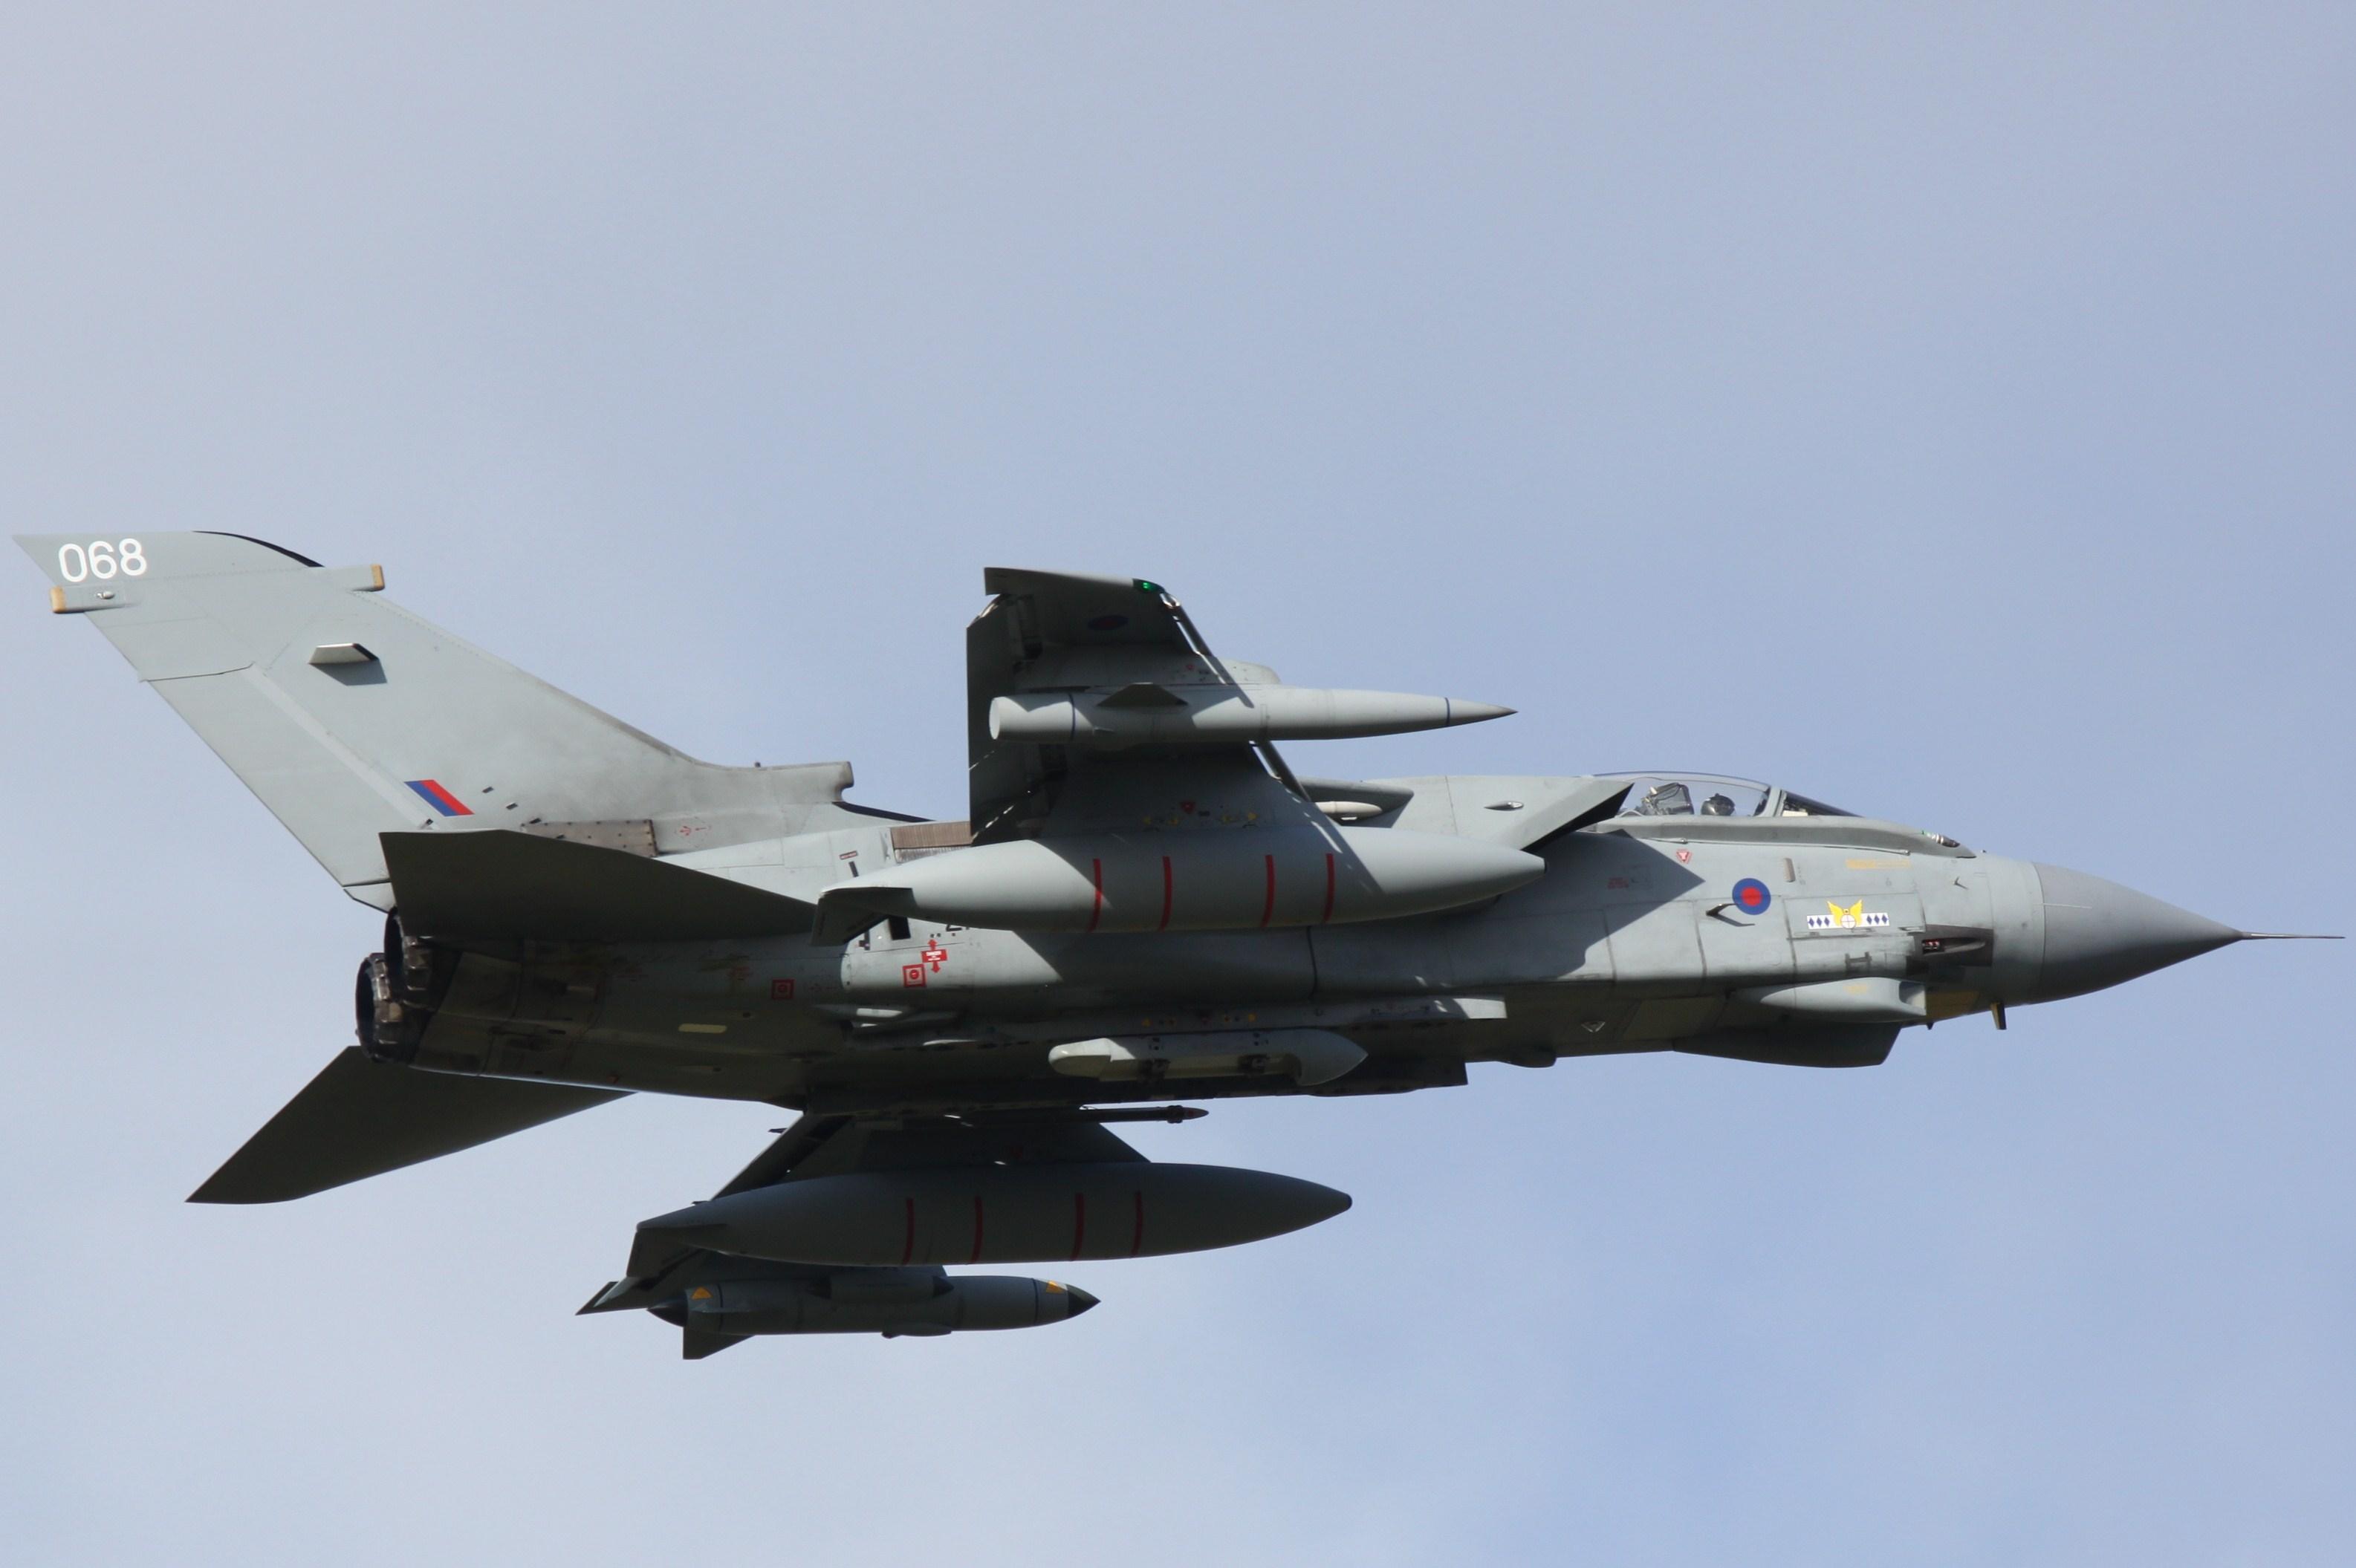 http://upload.wikimedia.org/wikipedia/commons/d/dc/Tornado_GR4_ZA604_086_14_Sqn_marks_(6282513365).jpg